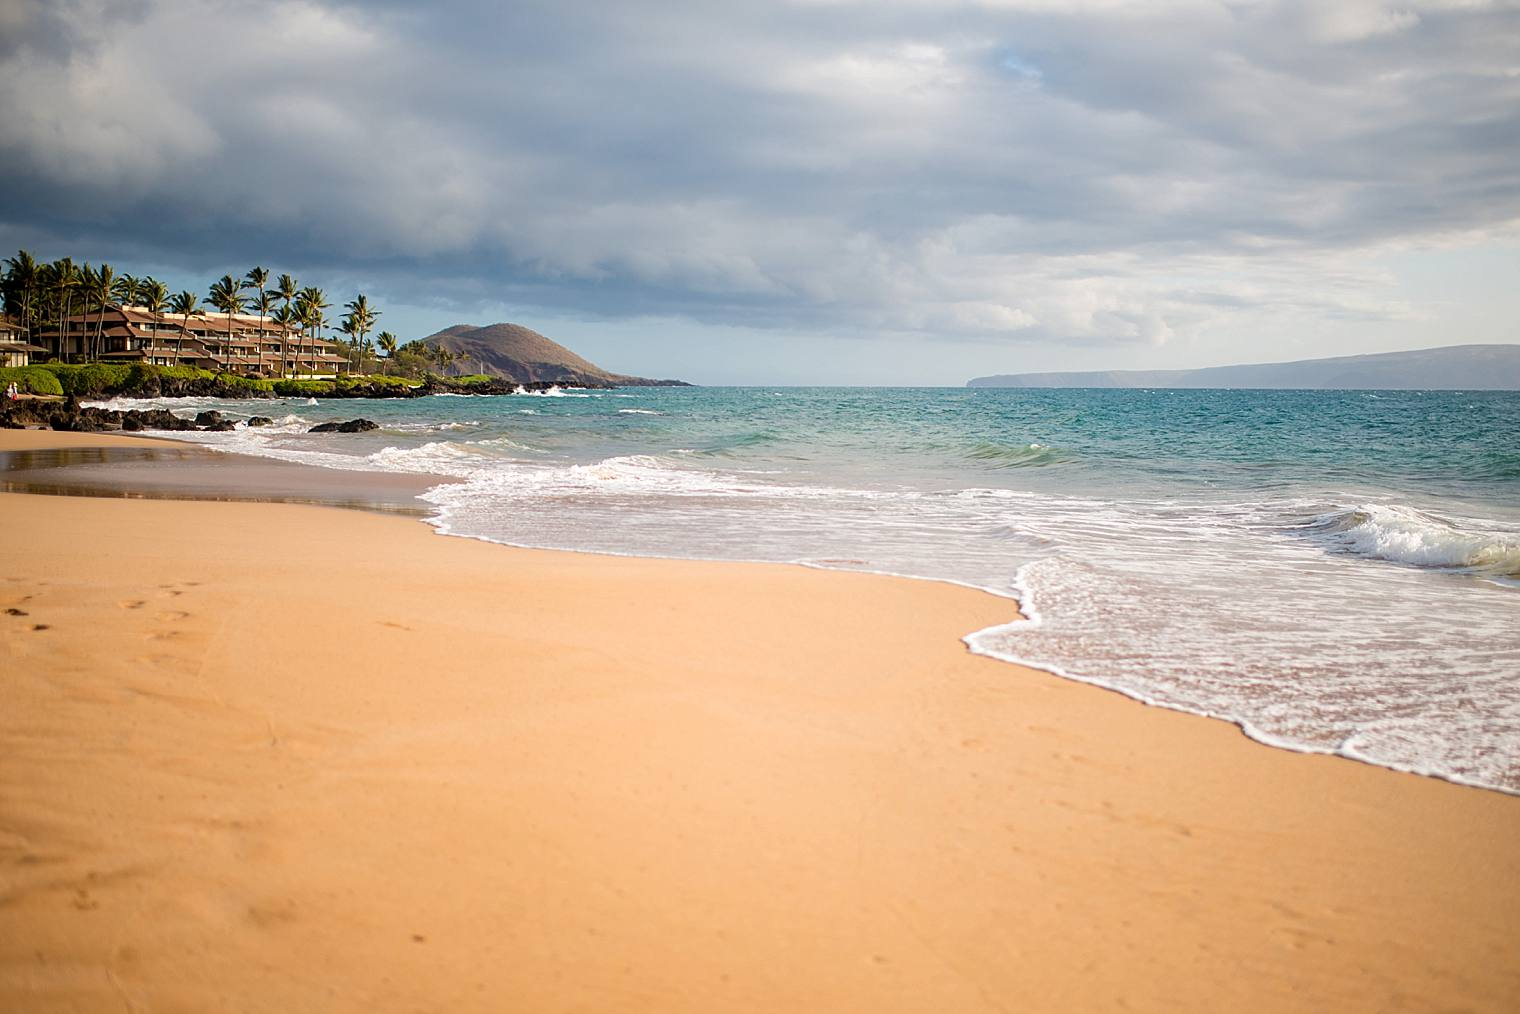 Po'olenalena Beach in Maui, Hawaii